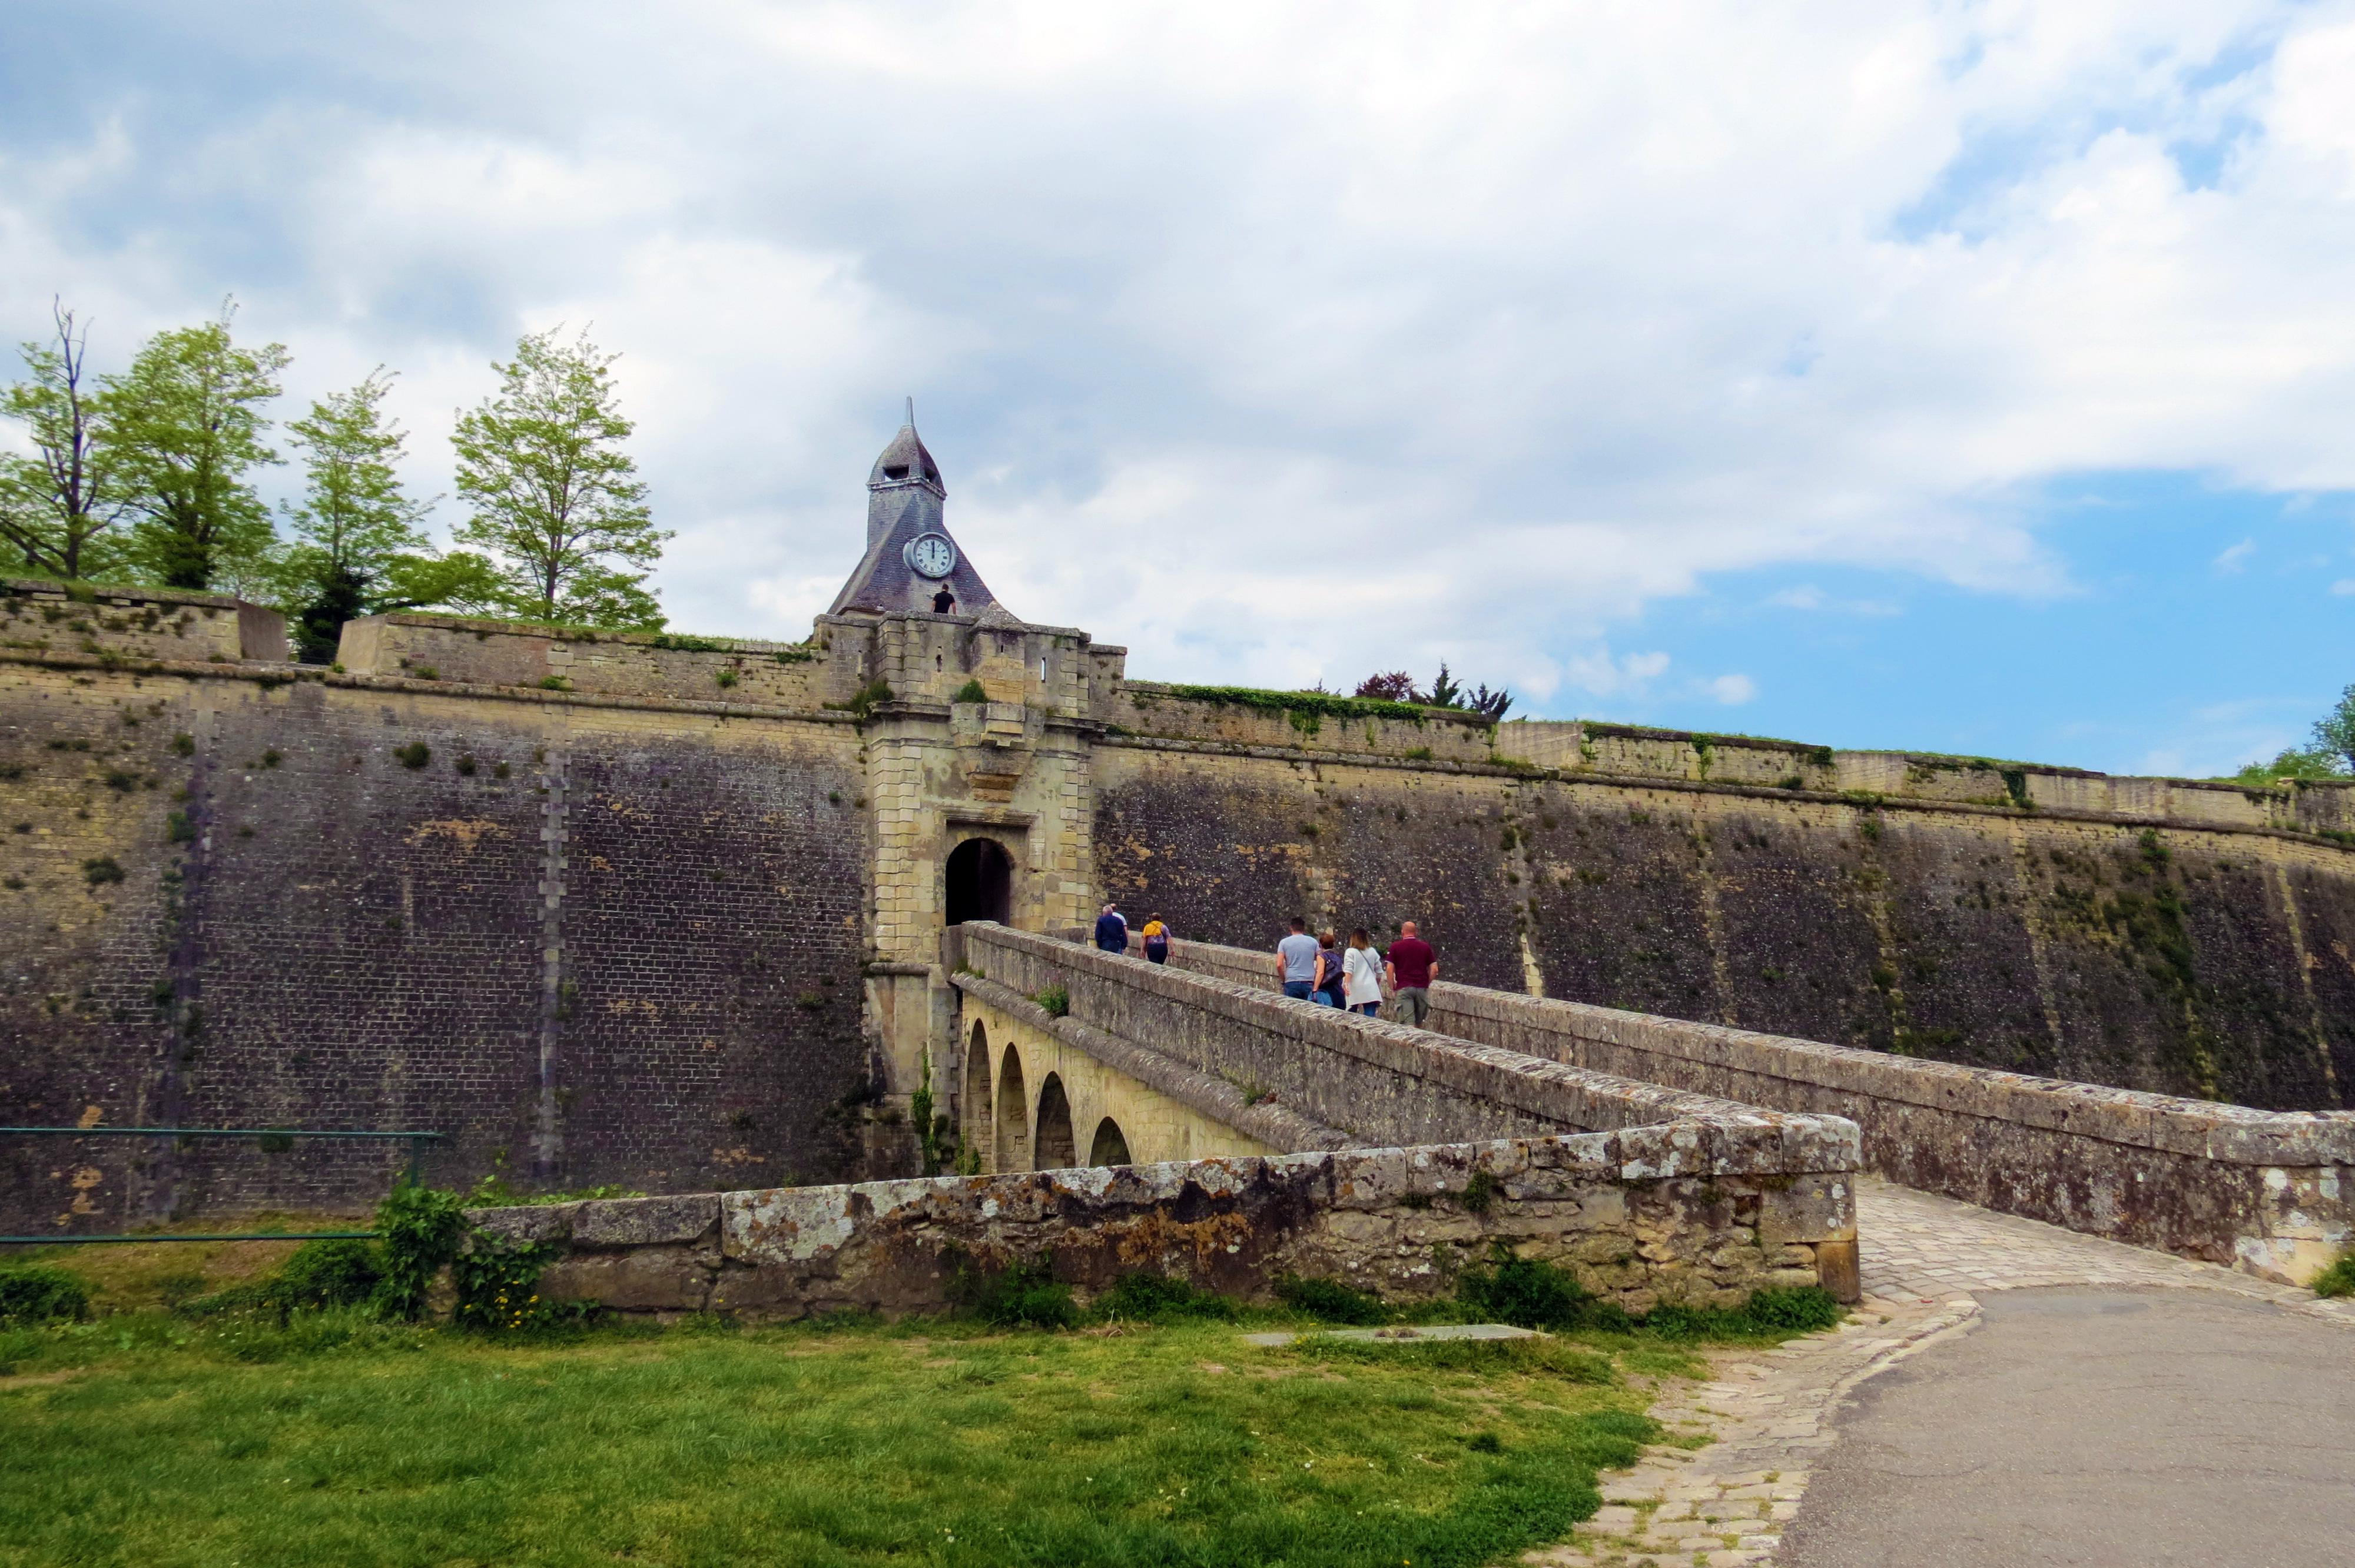 La porte Dauphine, Blaye, France